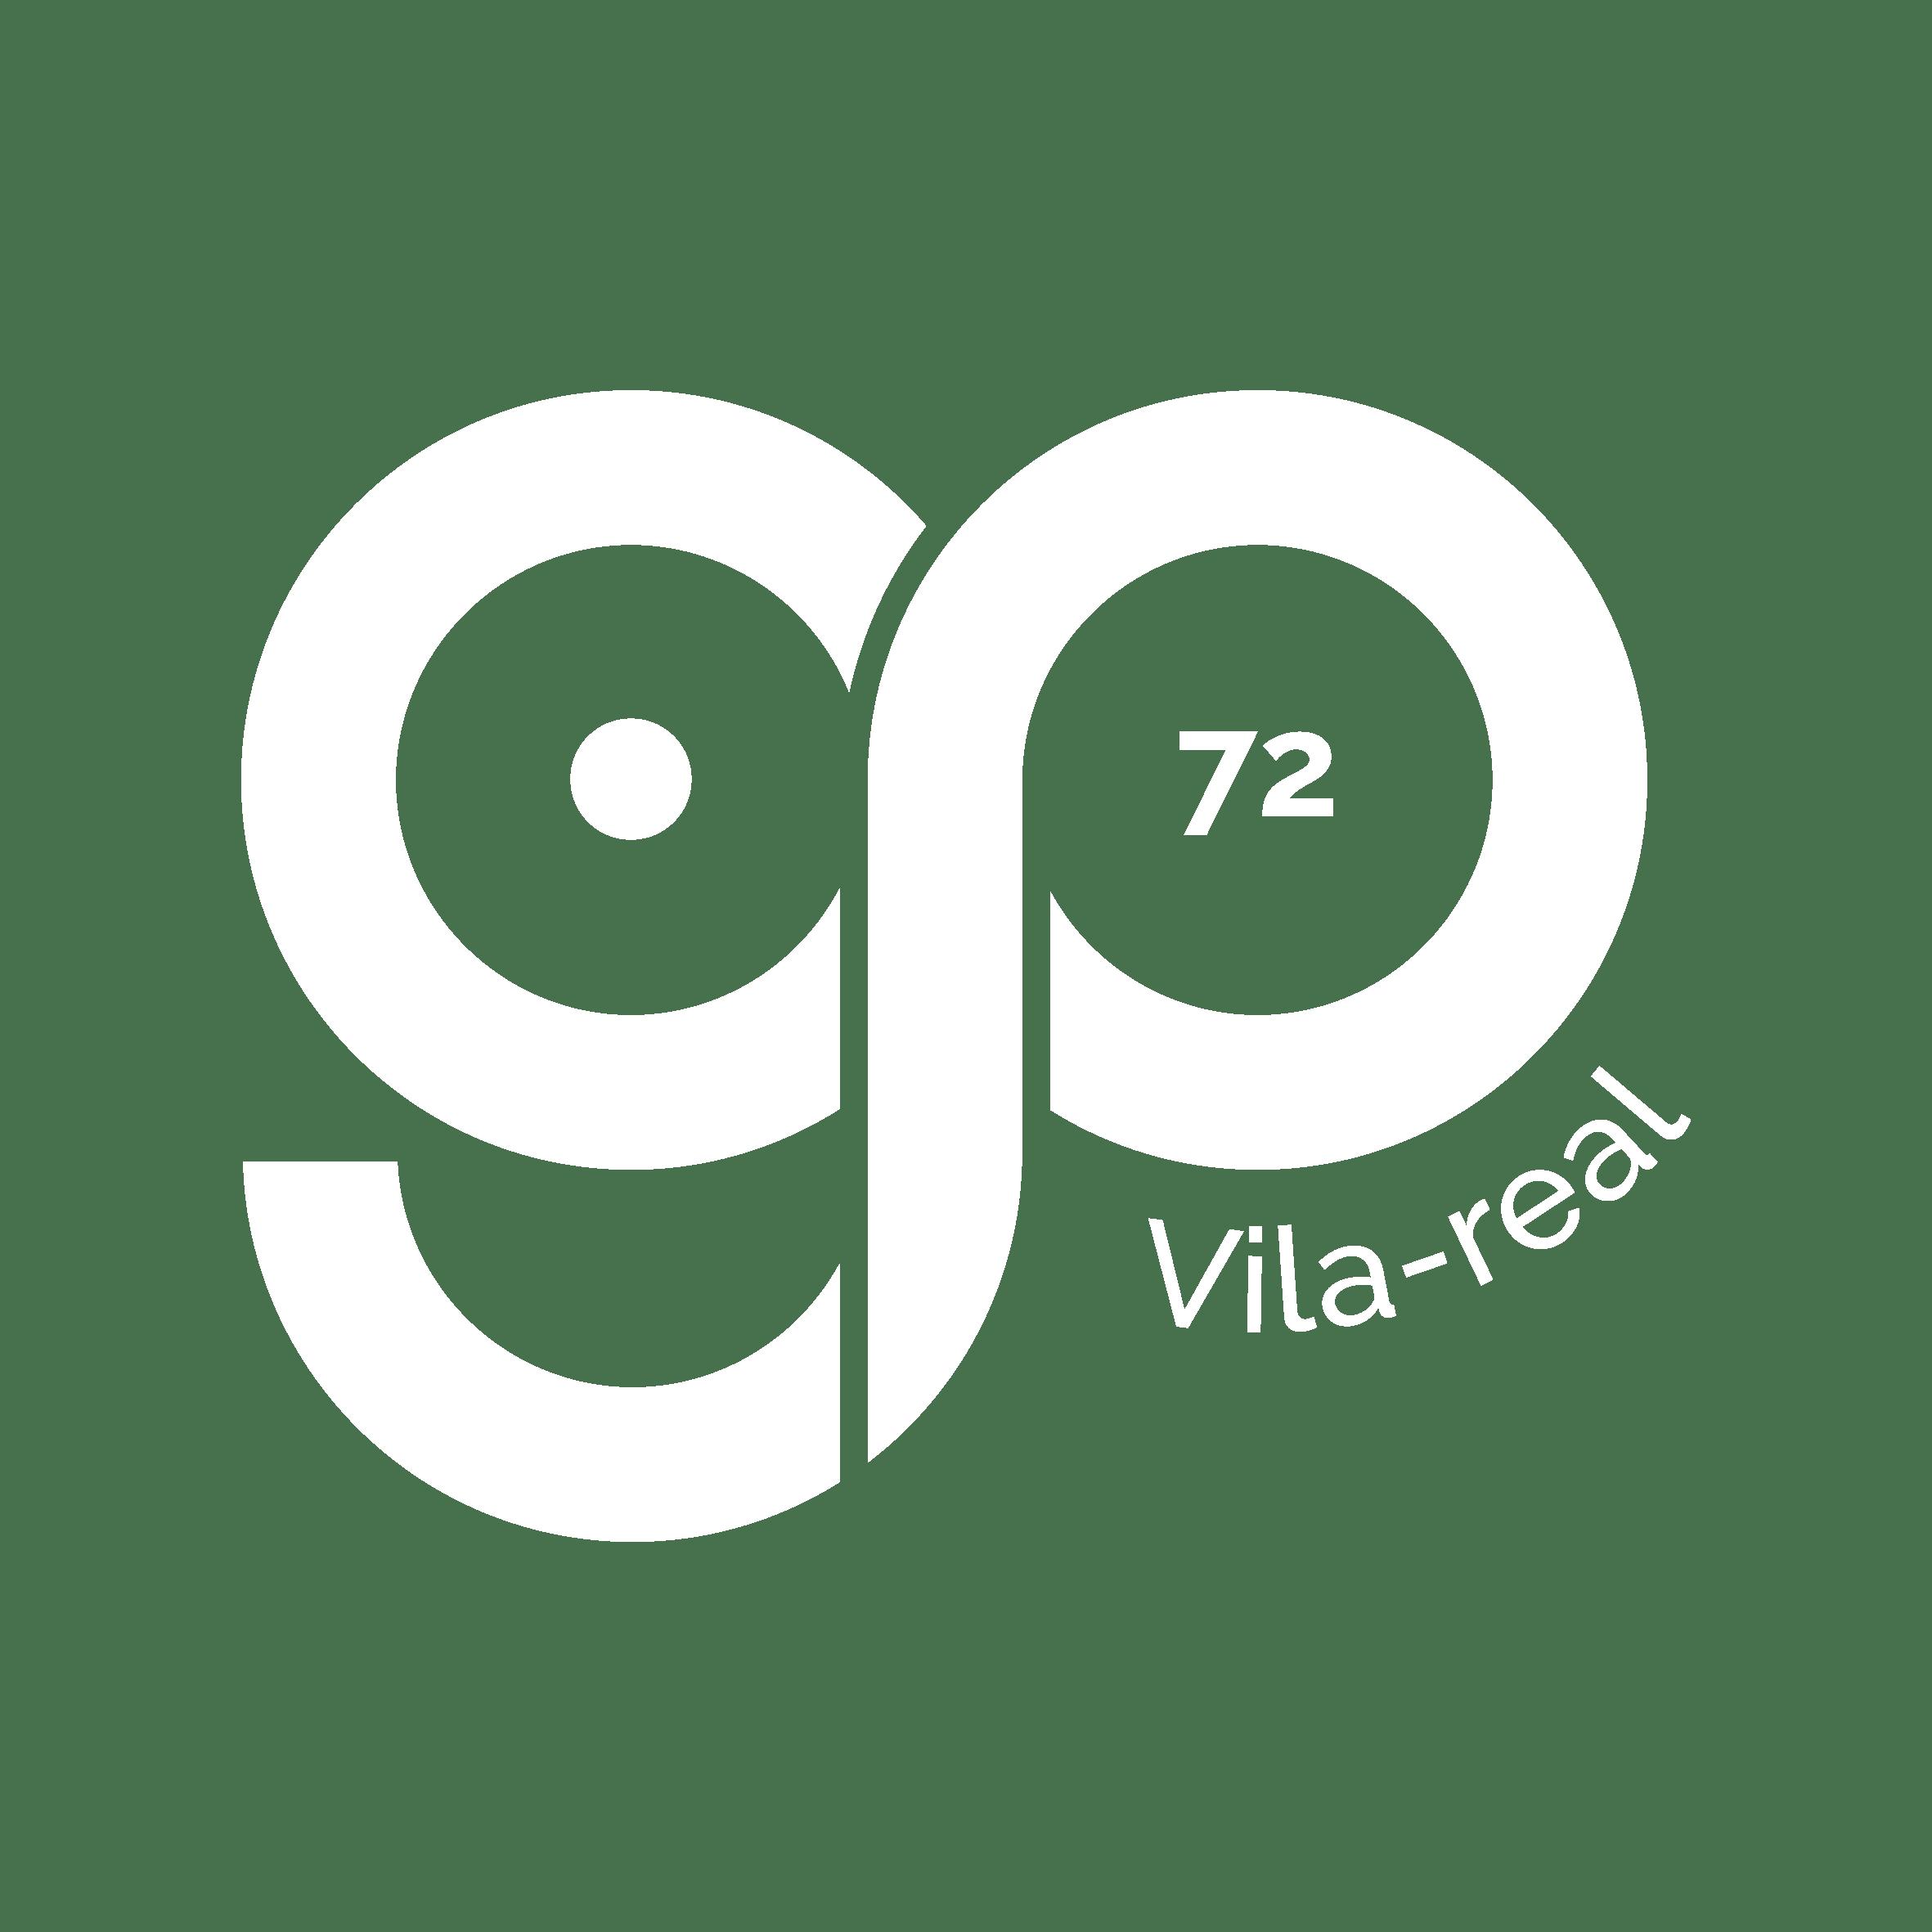 gpvila-real.com